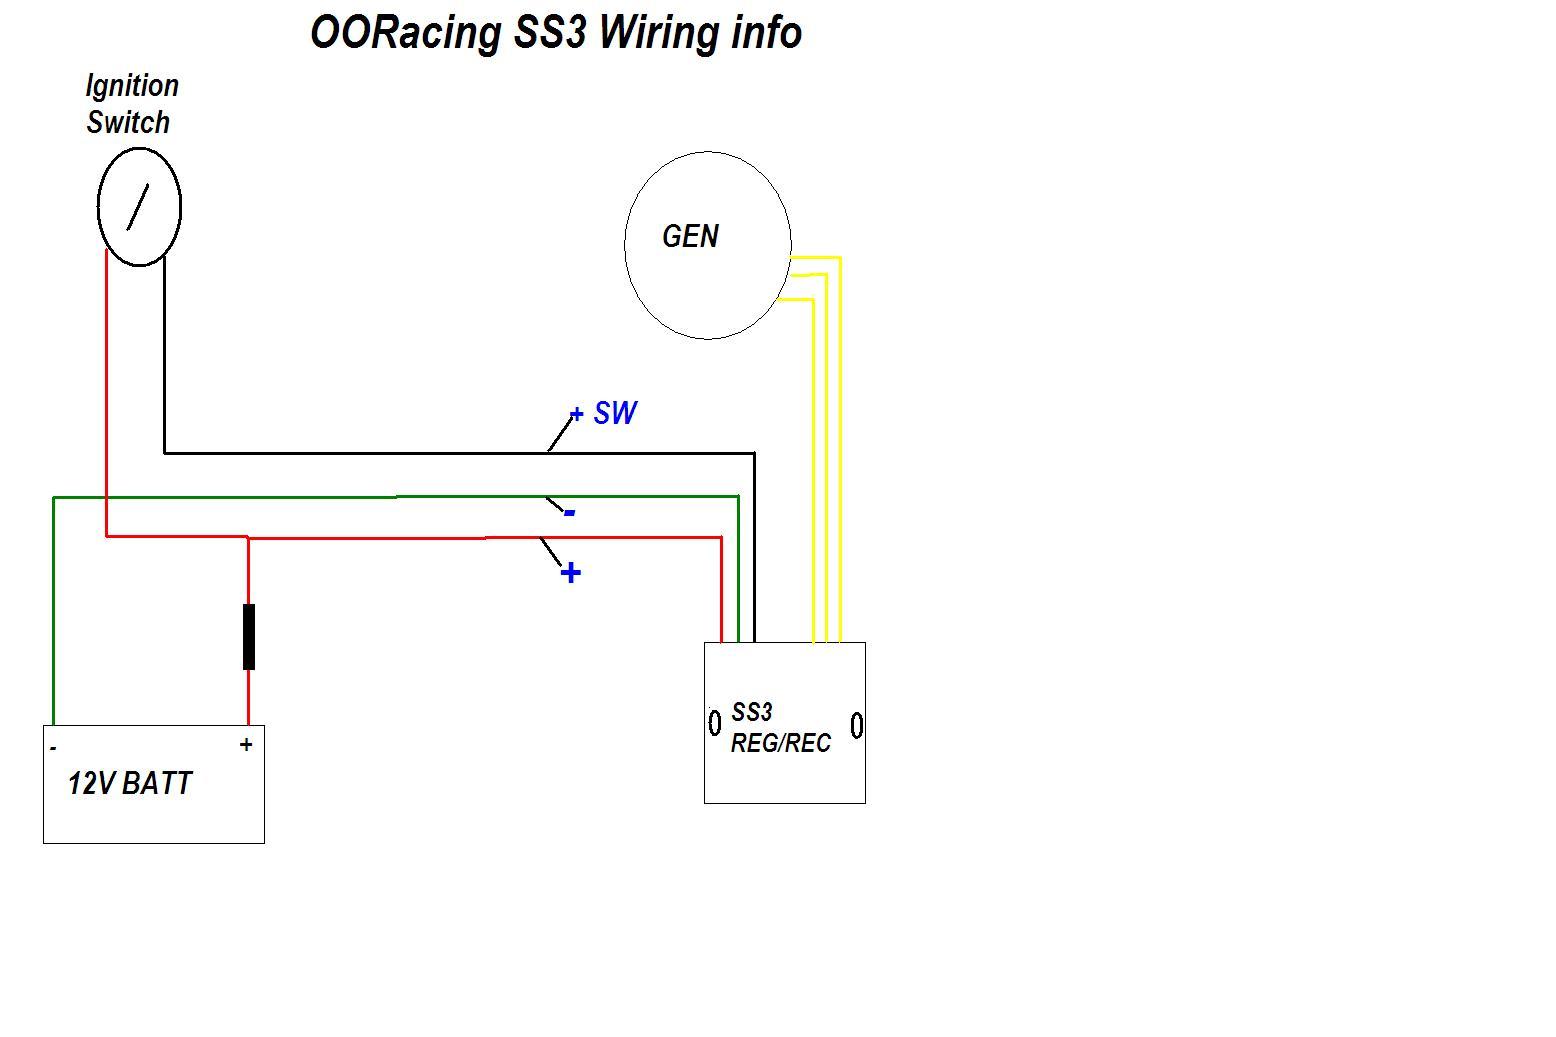 SS3_Gen_wiring?resize=640%2C427&ssl=1 pit bike wiring diagram kick start hobbiesxstyle wiring diagram for electric start pit bike at crackthecode.co